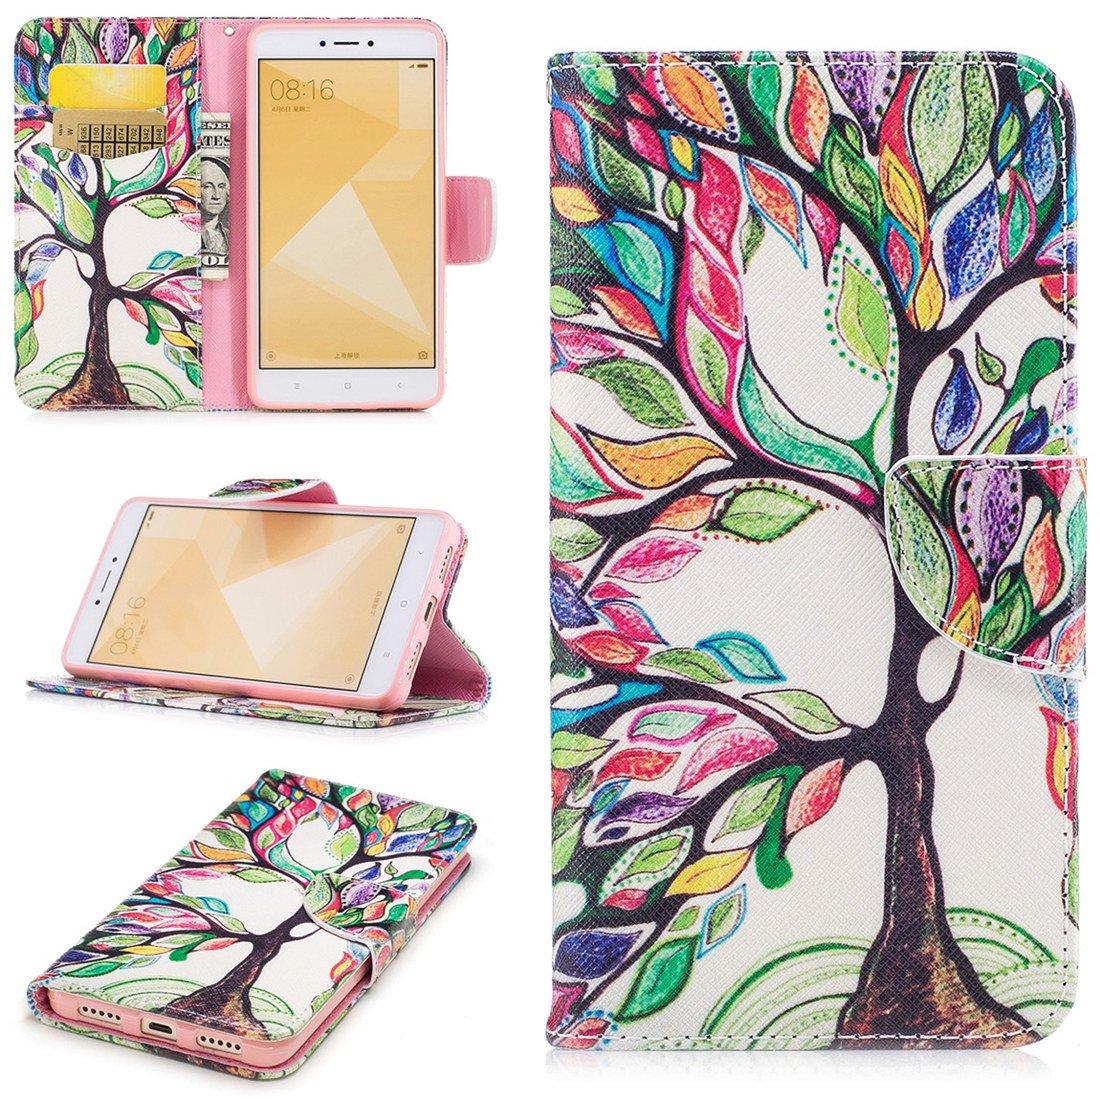 buy online c3ebb 0dcdb Amazon.com: Xiaomi Redmi Note 4X Case, ANGELLA-M PU Leather Wallet ...